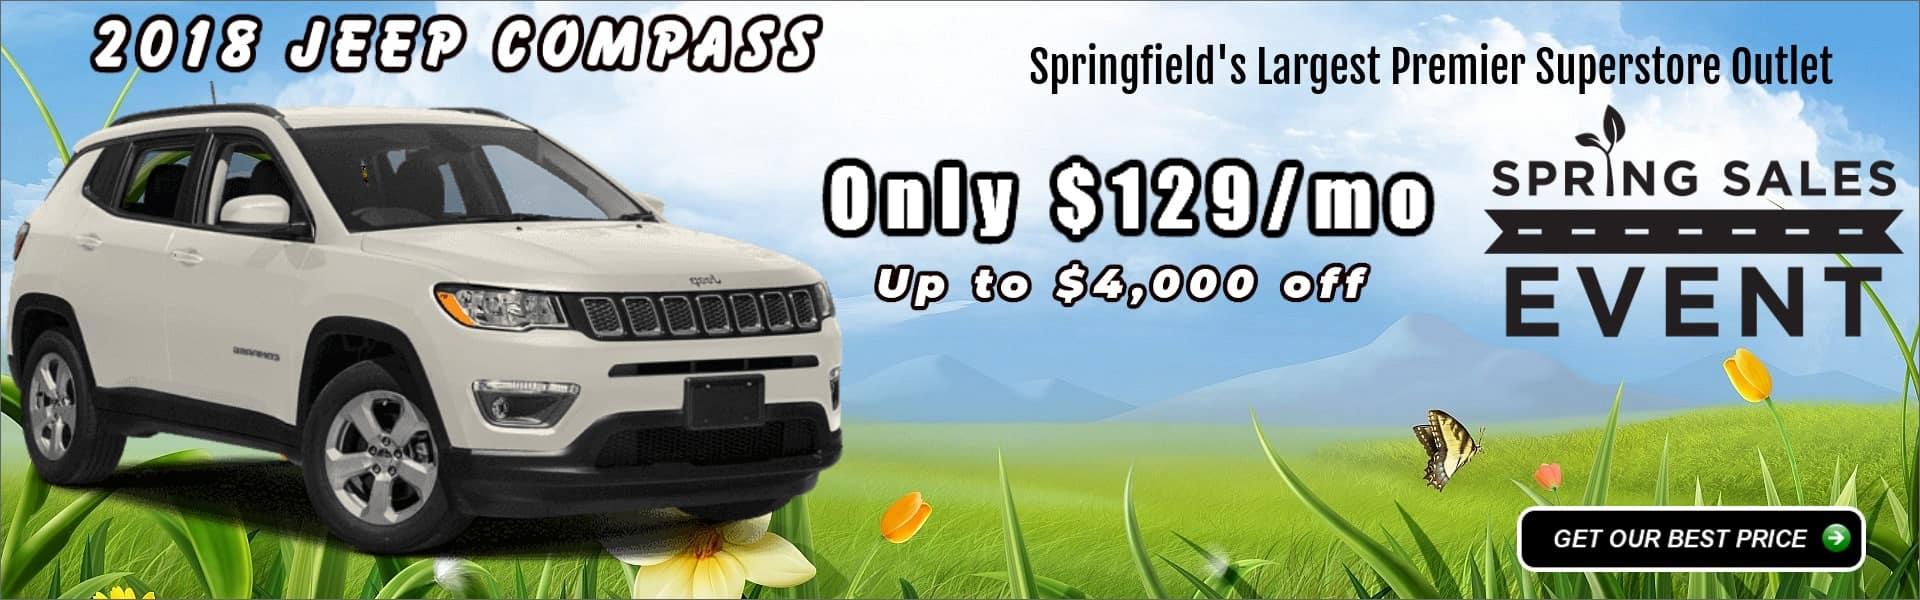 Bertera cjdr of west springfield chrysler dodge jeep for Southern motors springfield chrysler dodge jeep